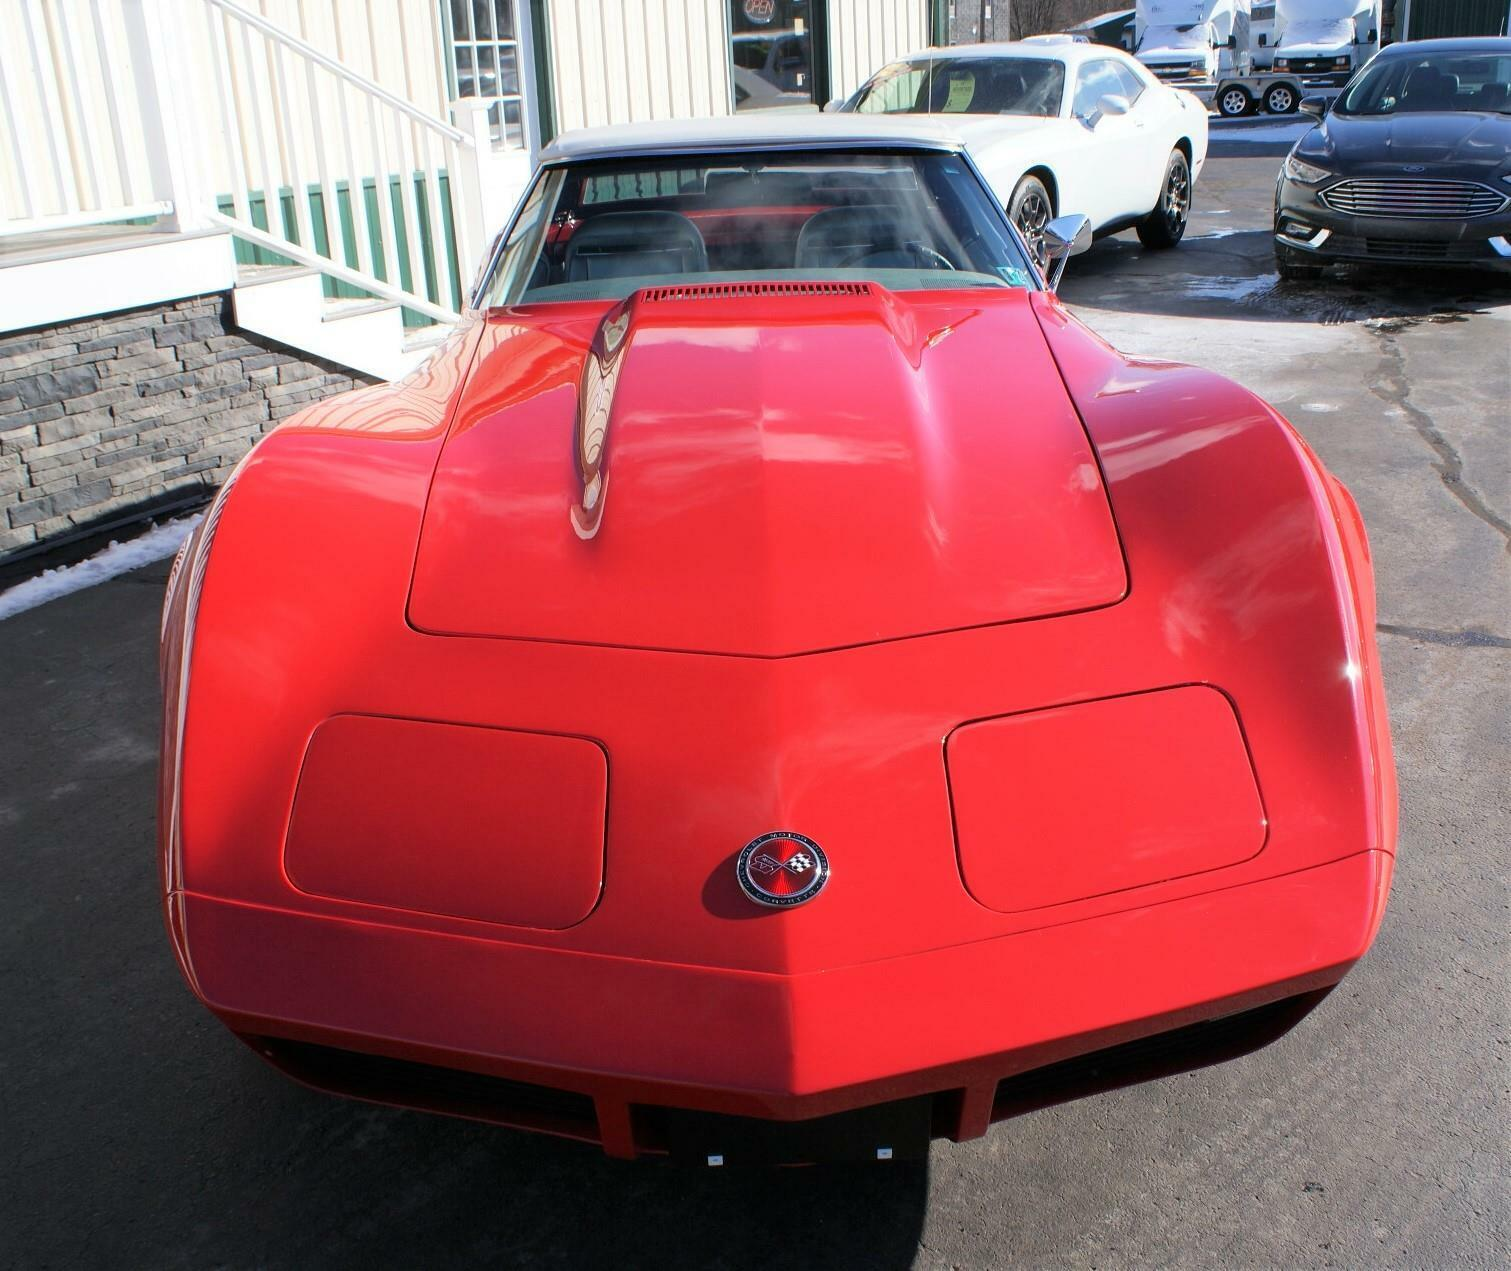 1974 Red Chevrolet Corvette  L82   C3 Corvette Photo 4